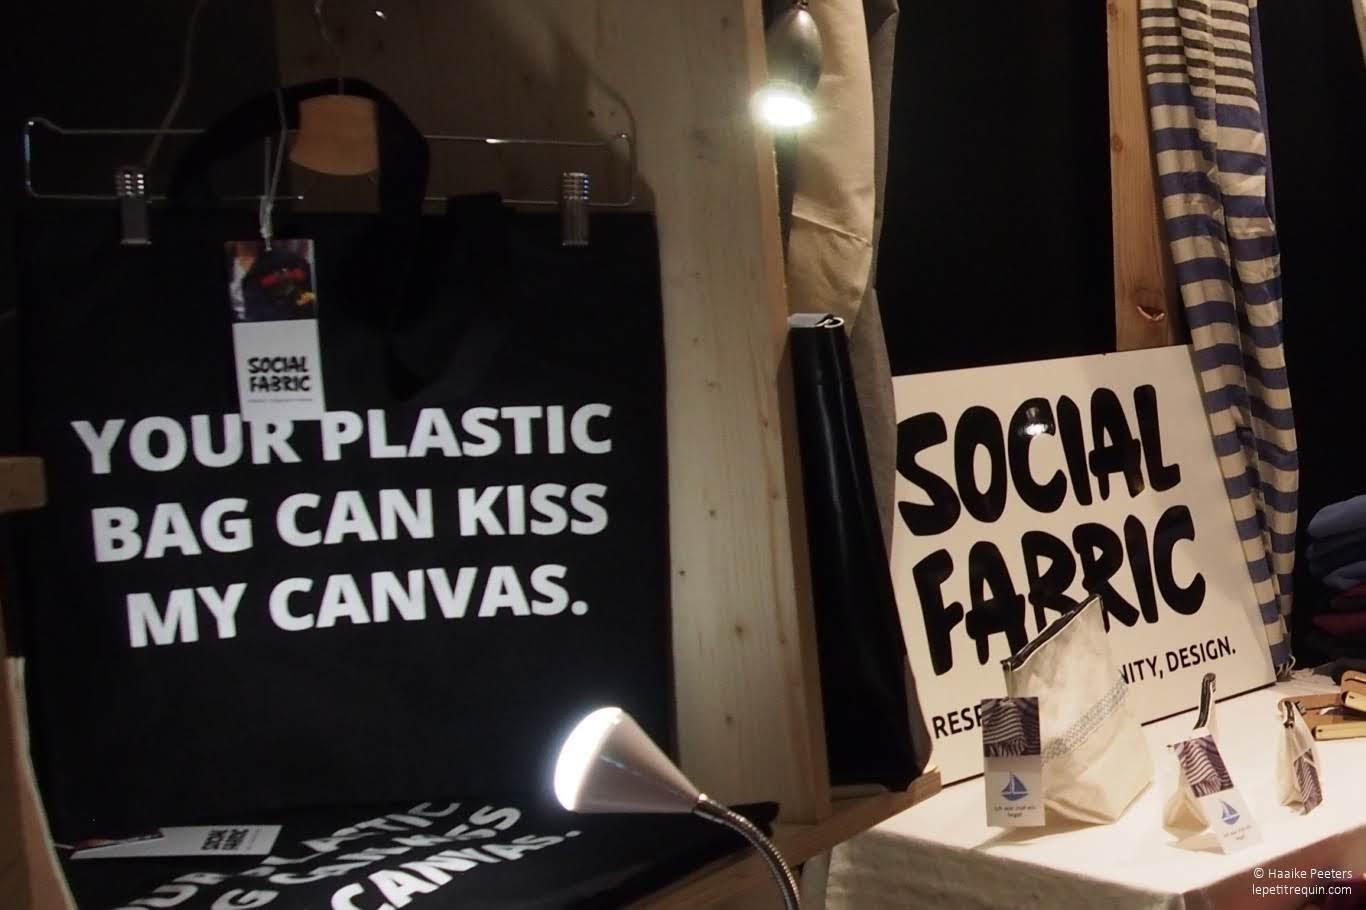 DesignGut Social Fabric (Le petit requin)